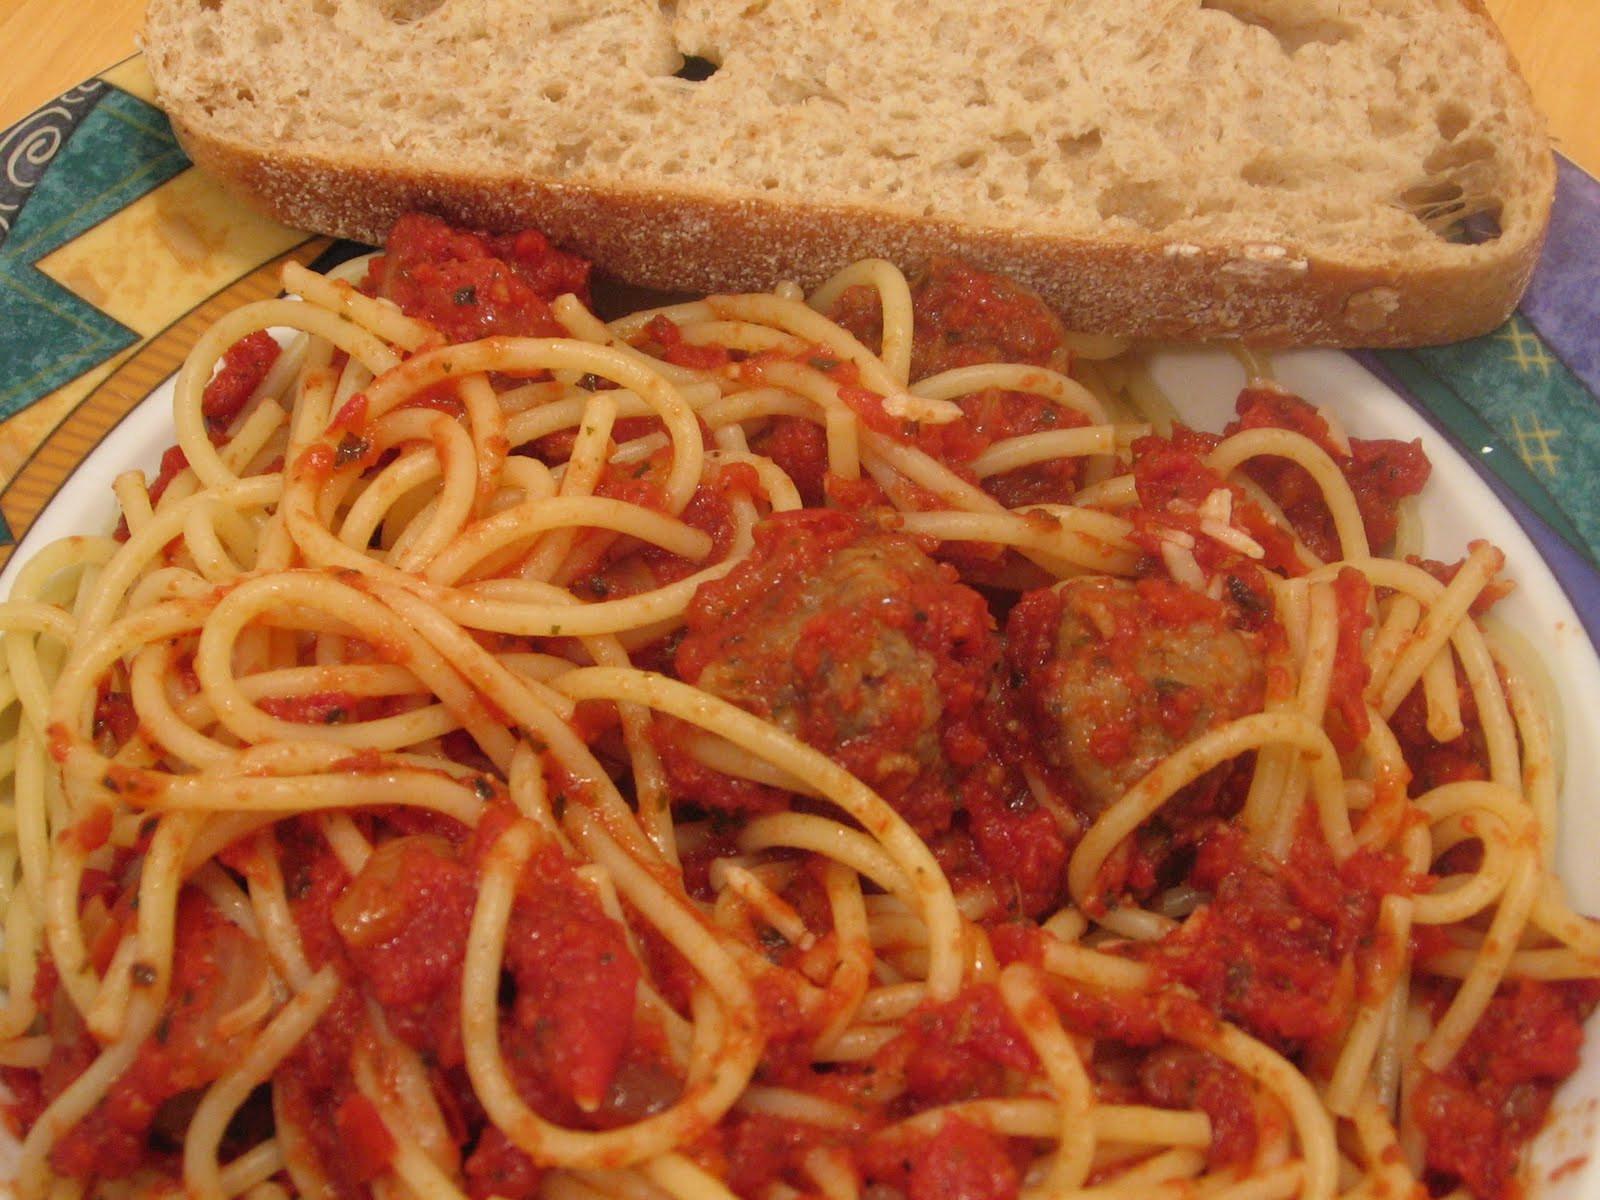 Spaghetti With Italian Sausage  Jenn s Food Journey Spaghetti with Hot Italian Sausage